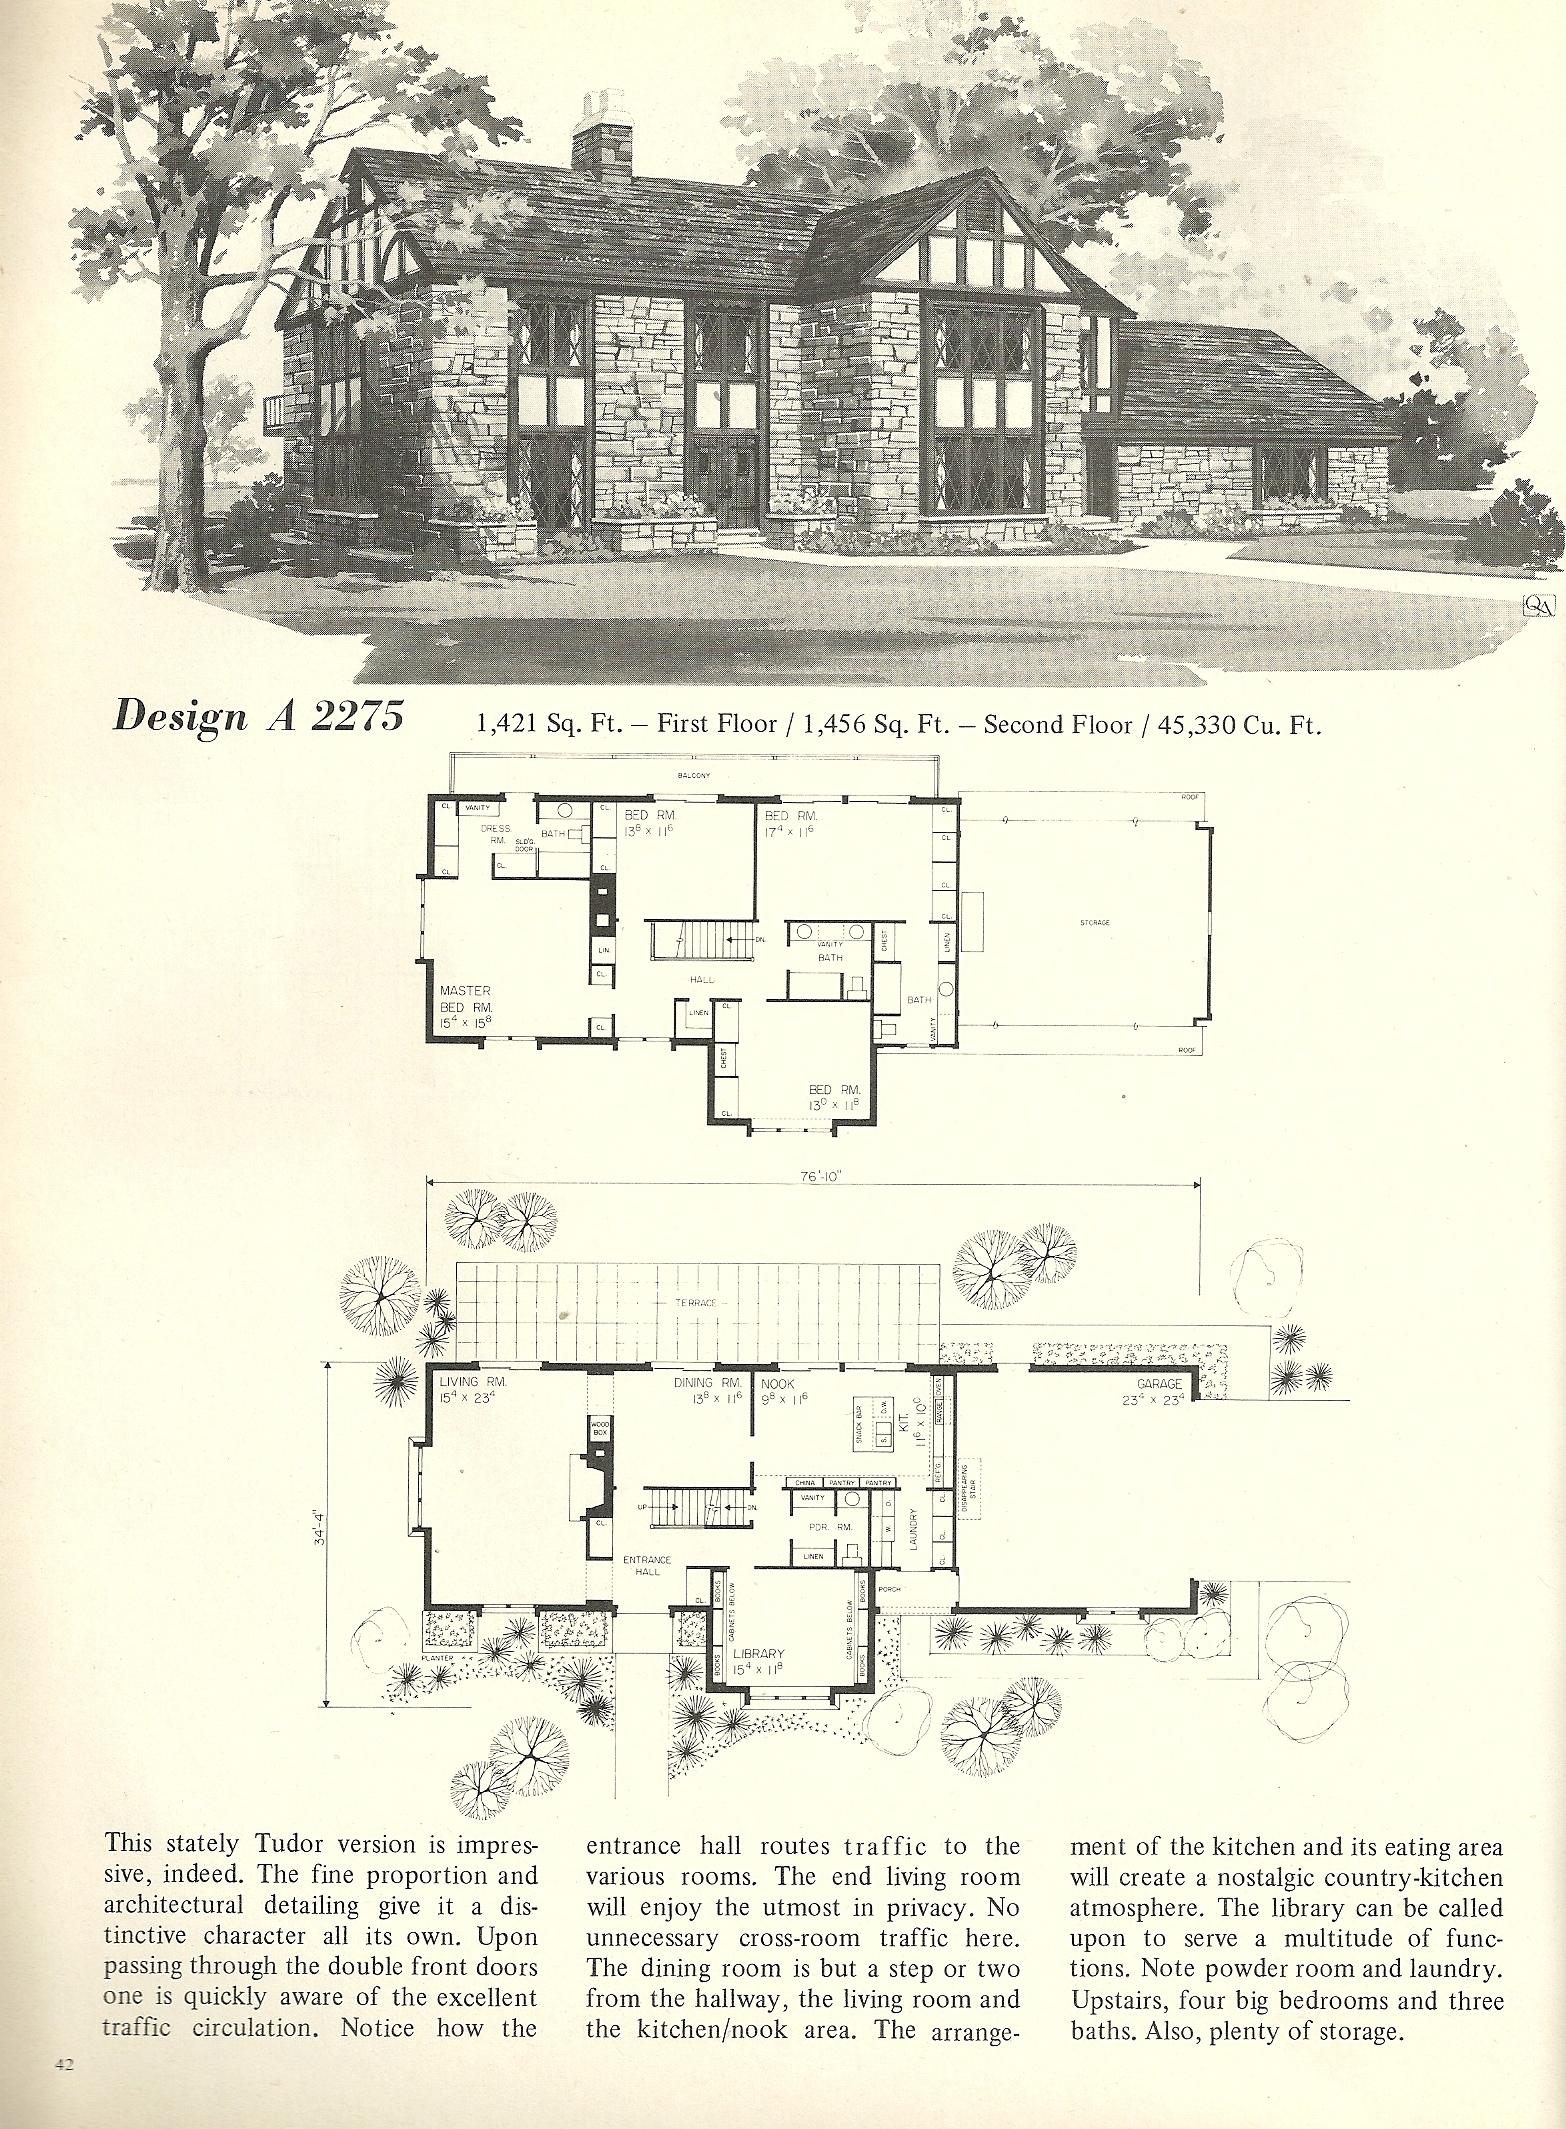 Vintage House Plans 2275 | Antique Alter Ego